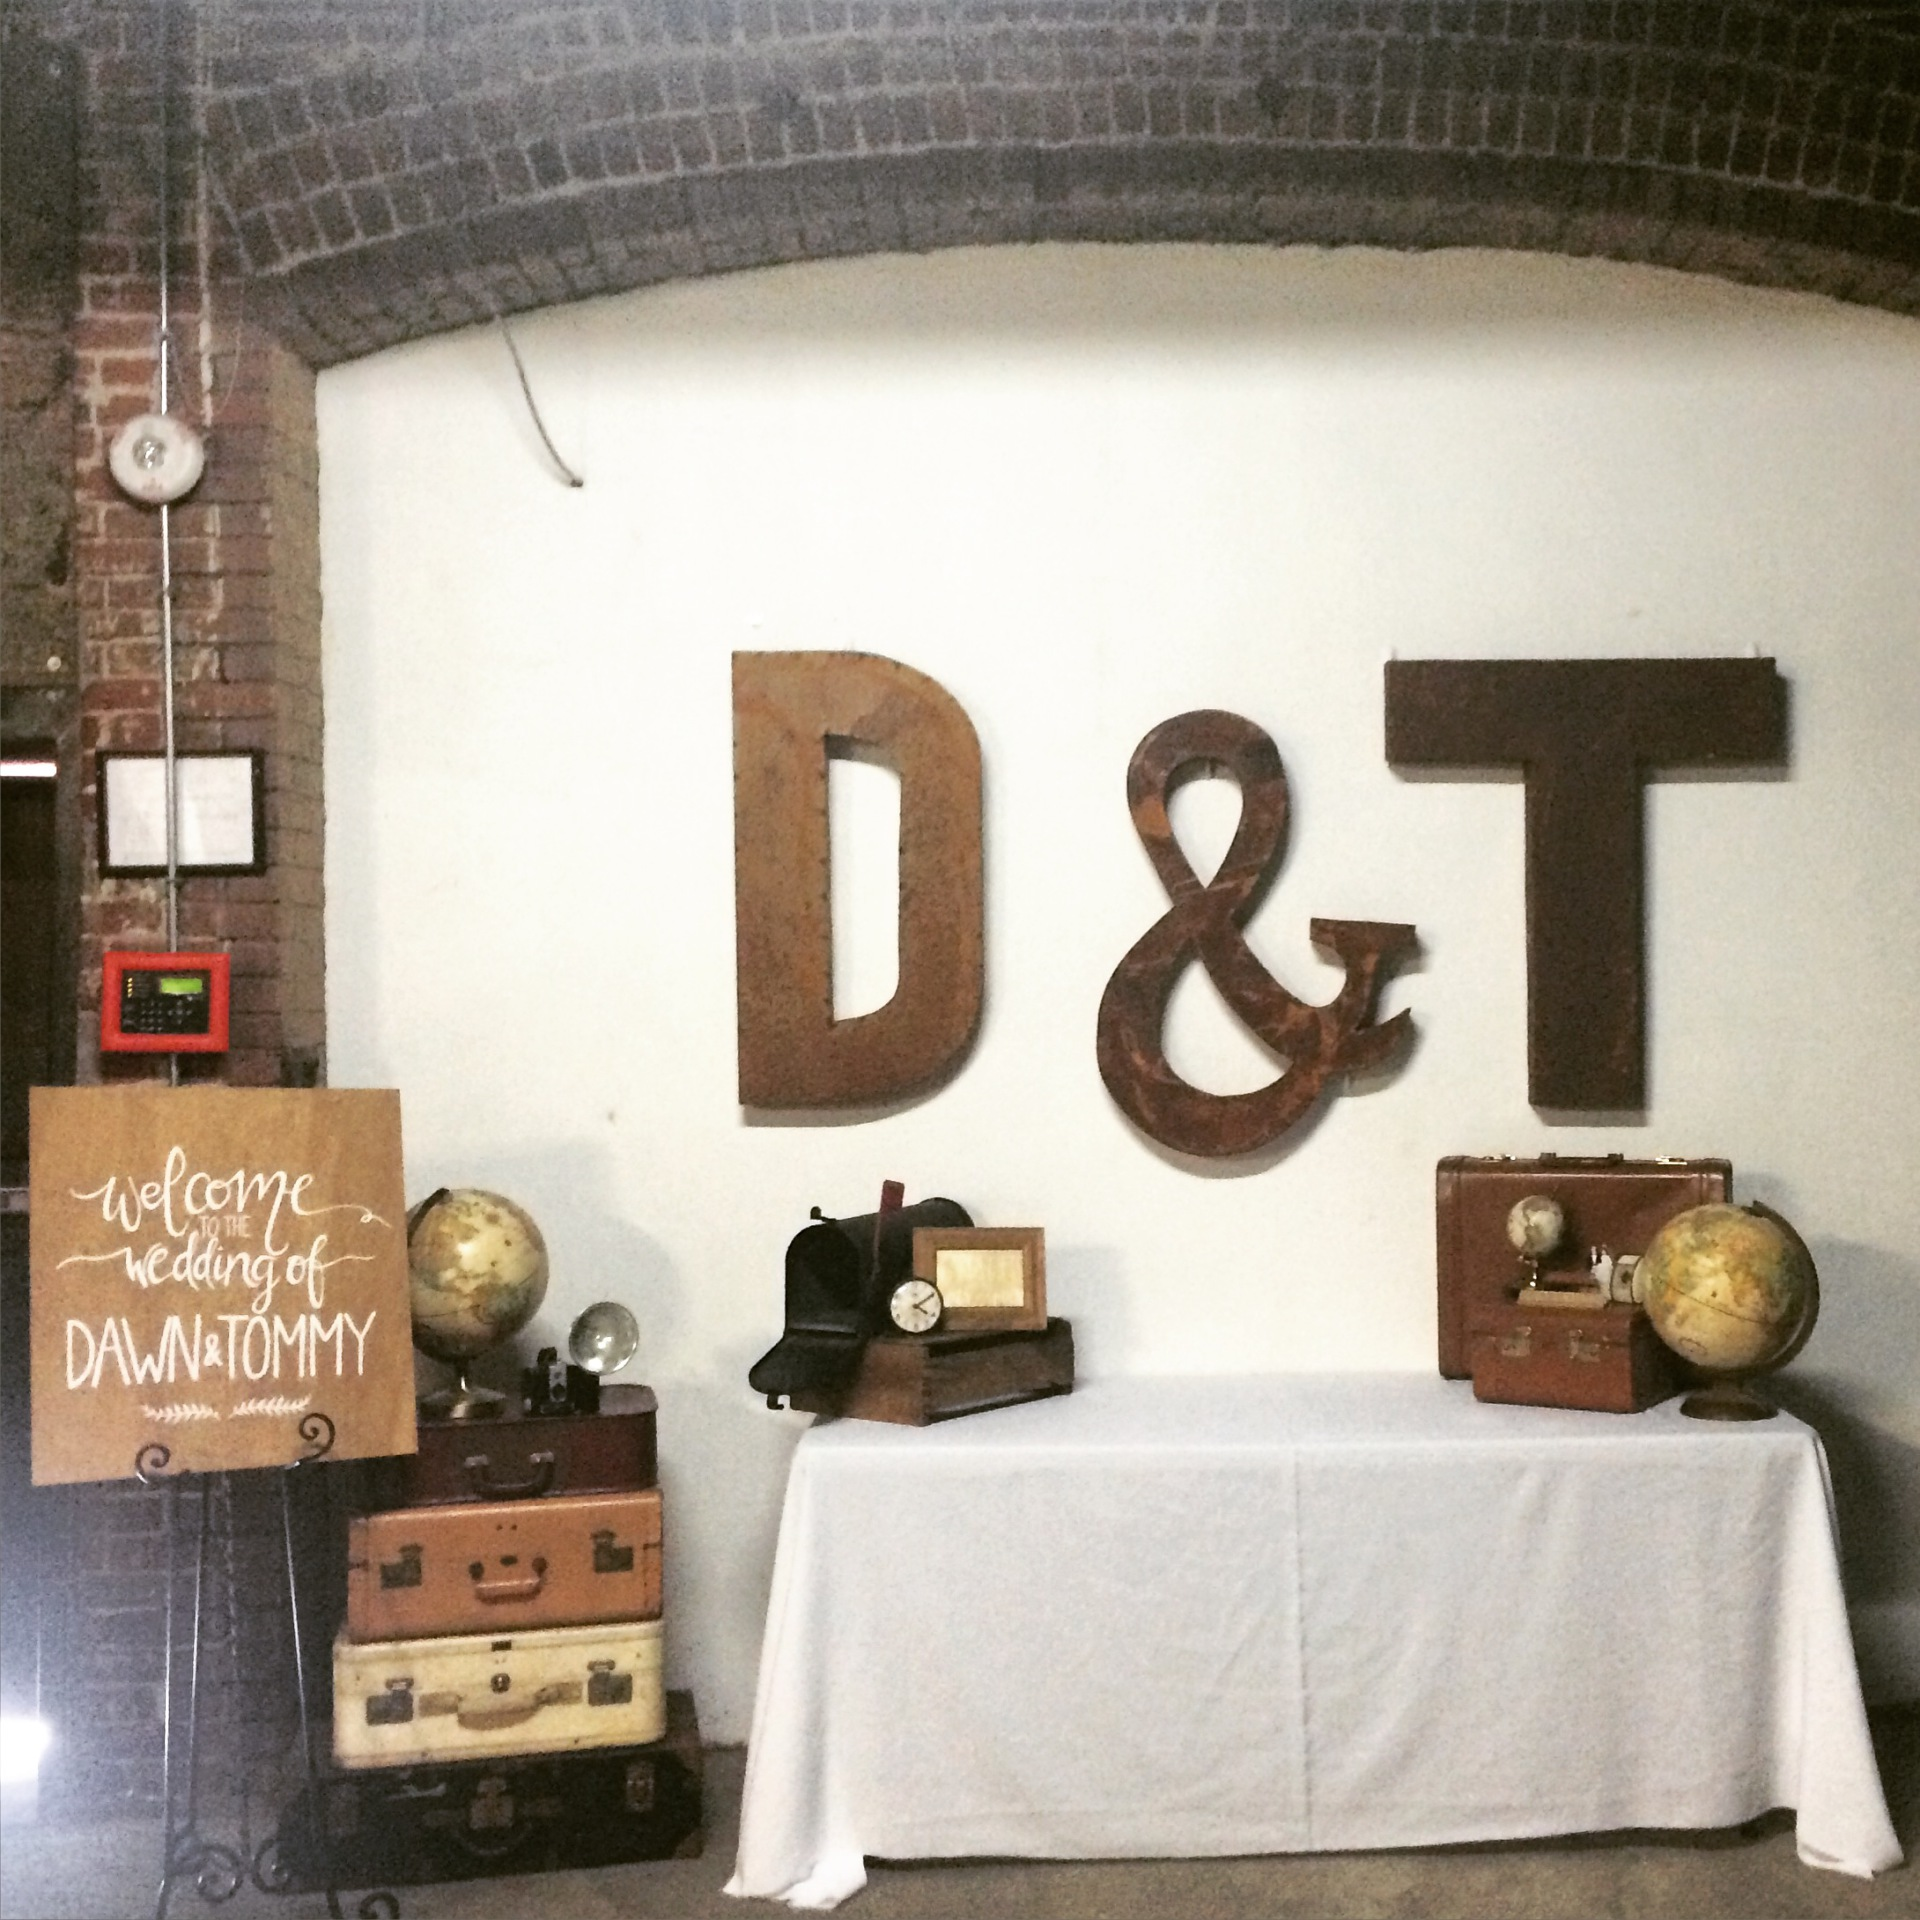 Urban LA gift table set up